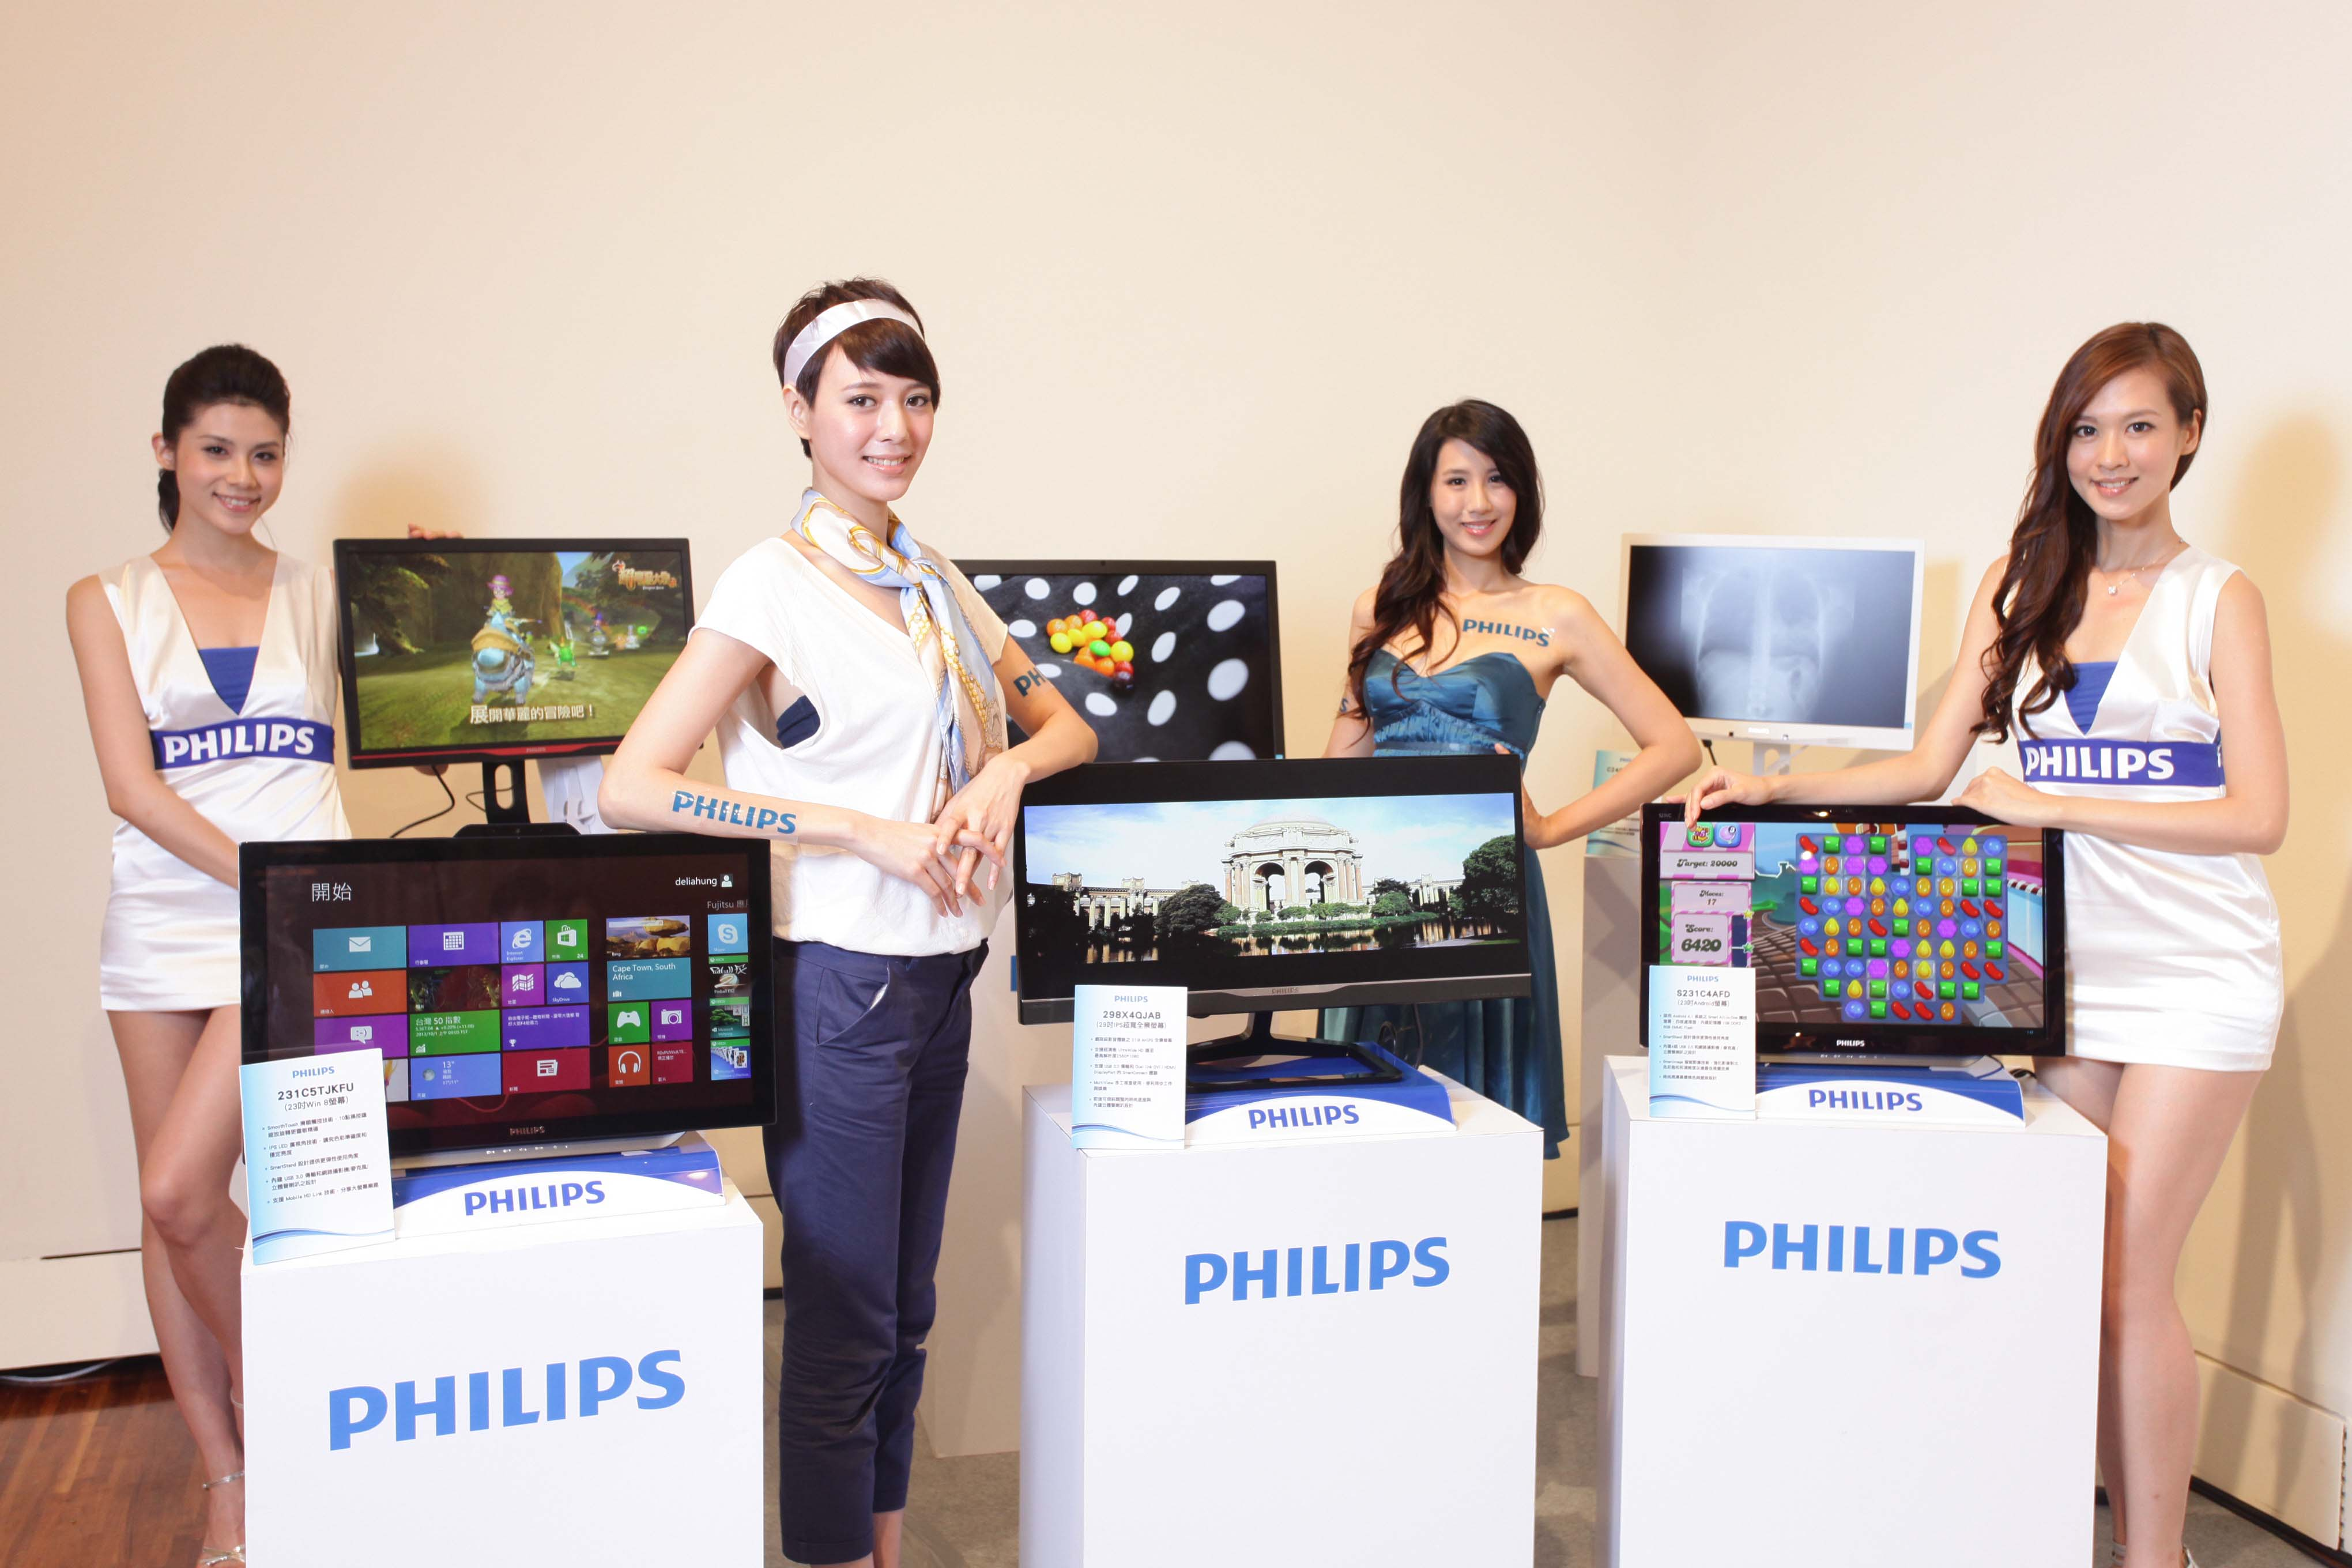 PHILIPS顯示技術領頭羊 重返台灣搶攻市佔 挾Smart TV與 Monitor產品雙陣線 重裝上陣 尖端影像處理技術挑戰視覺震撼極限